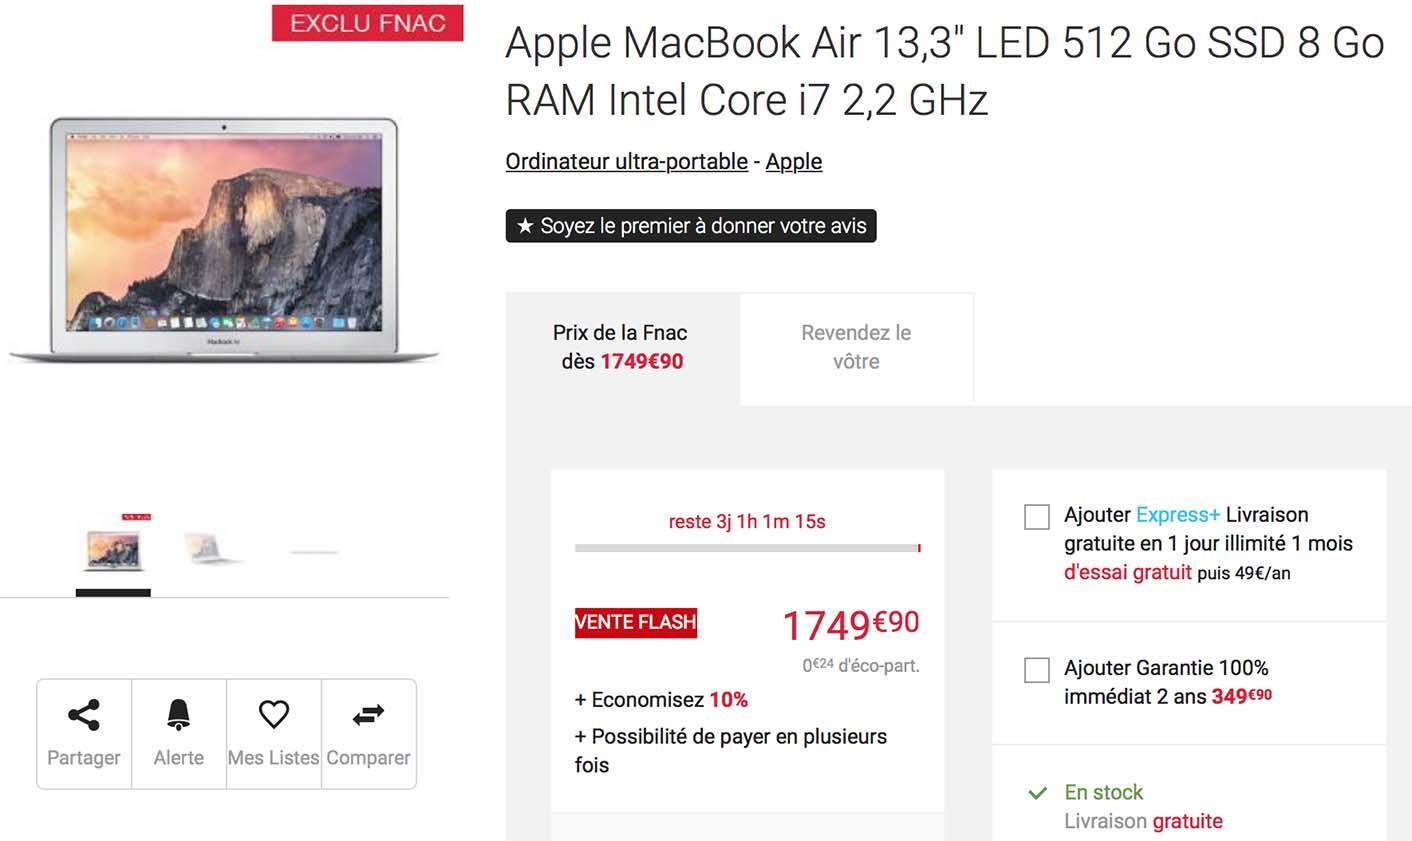 consomac le macbook air haut de gamme en vente flash. Black Bedroom Furniture Sets. Home Design Ideas